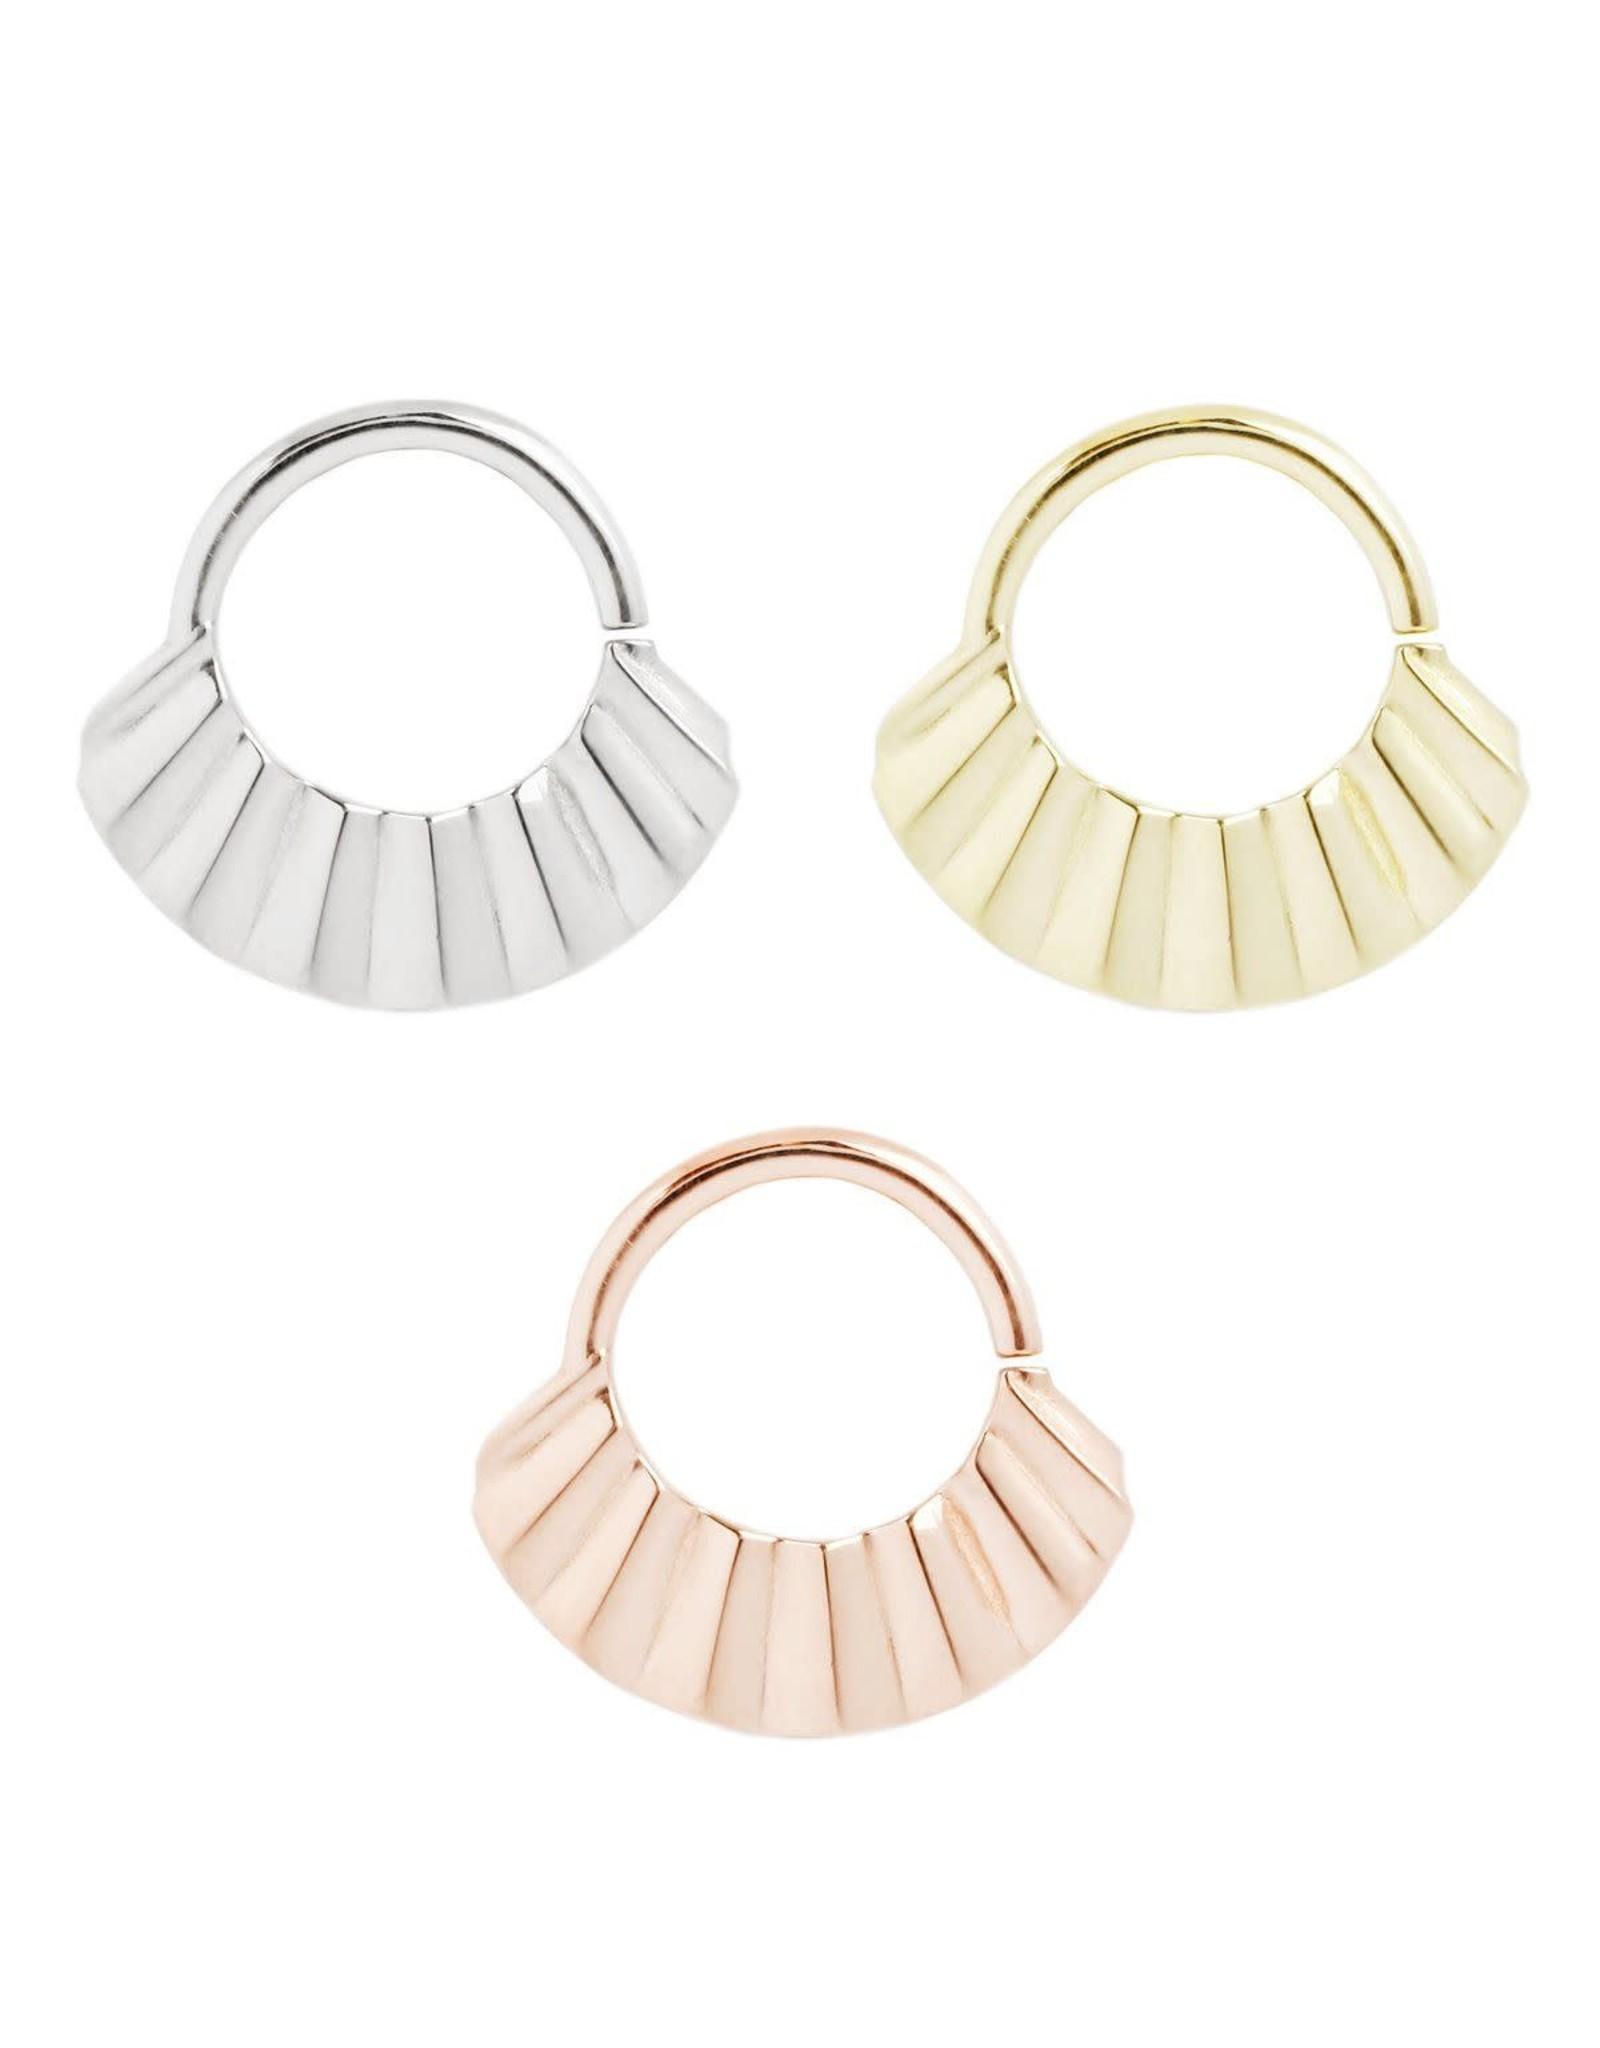 "Buddha Jewelry Organics Buddha Jewelry Organics 16g 5/16 ""Hype"" seam ring"